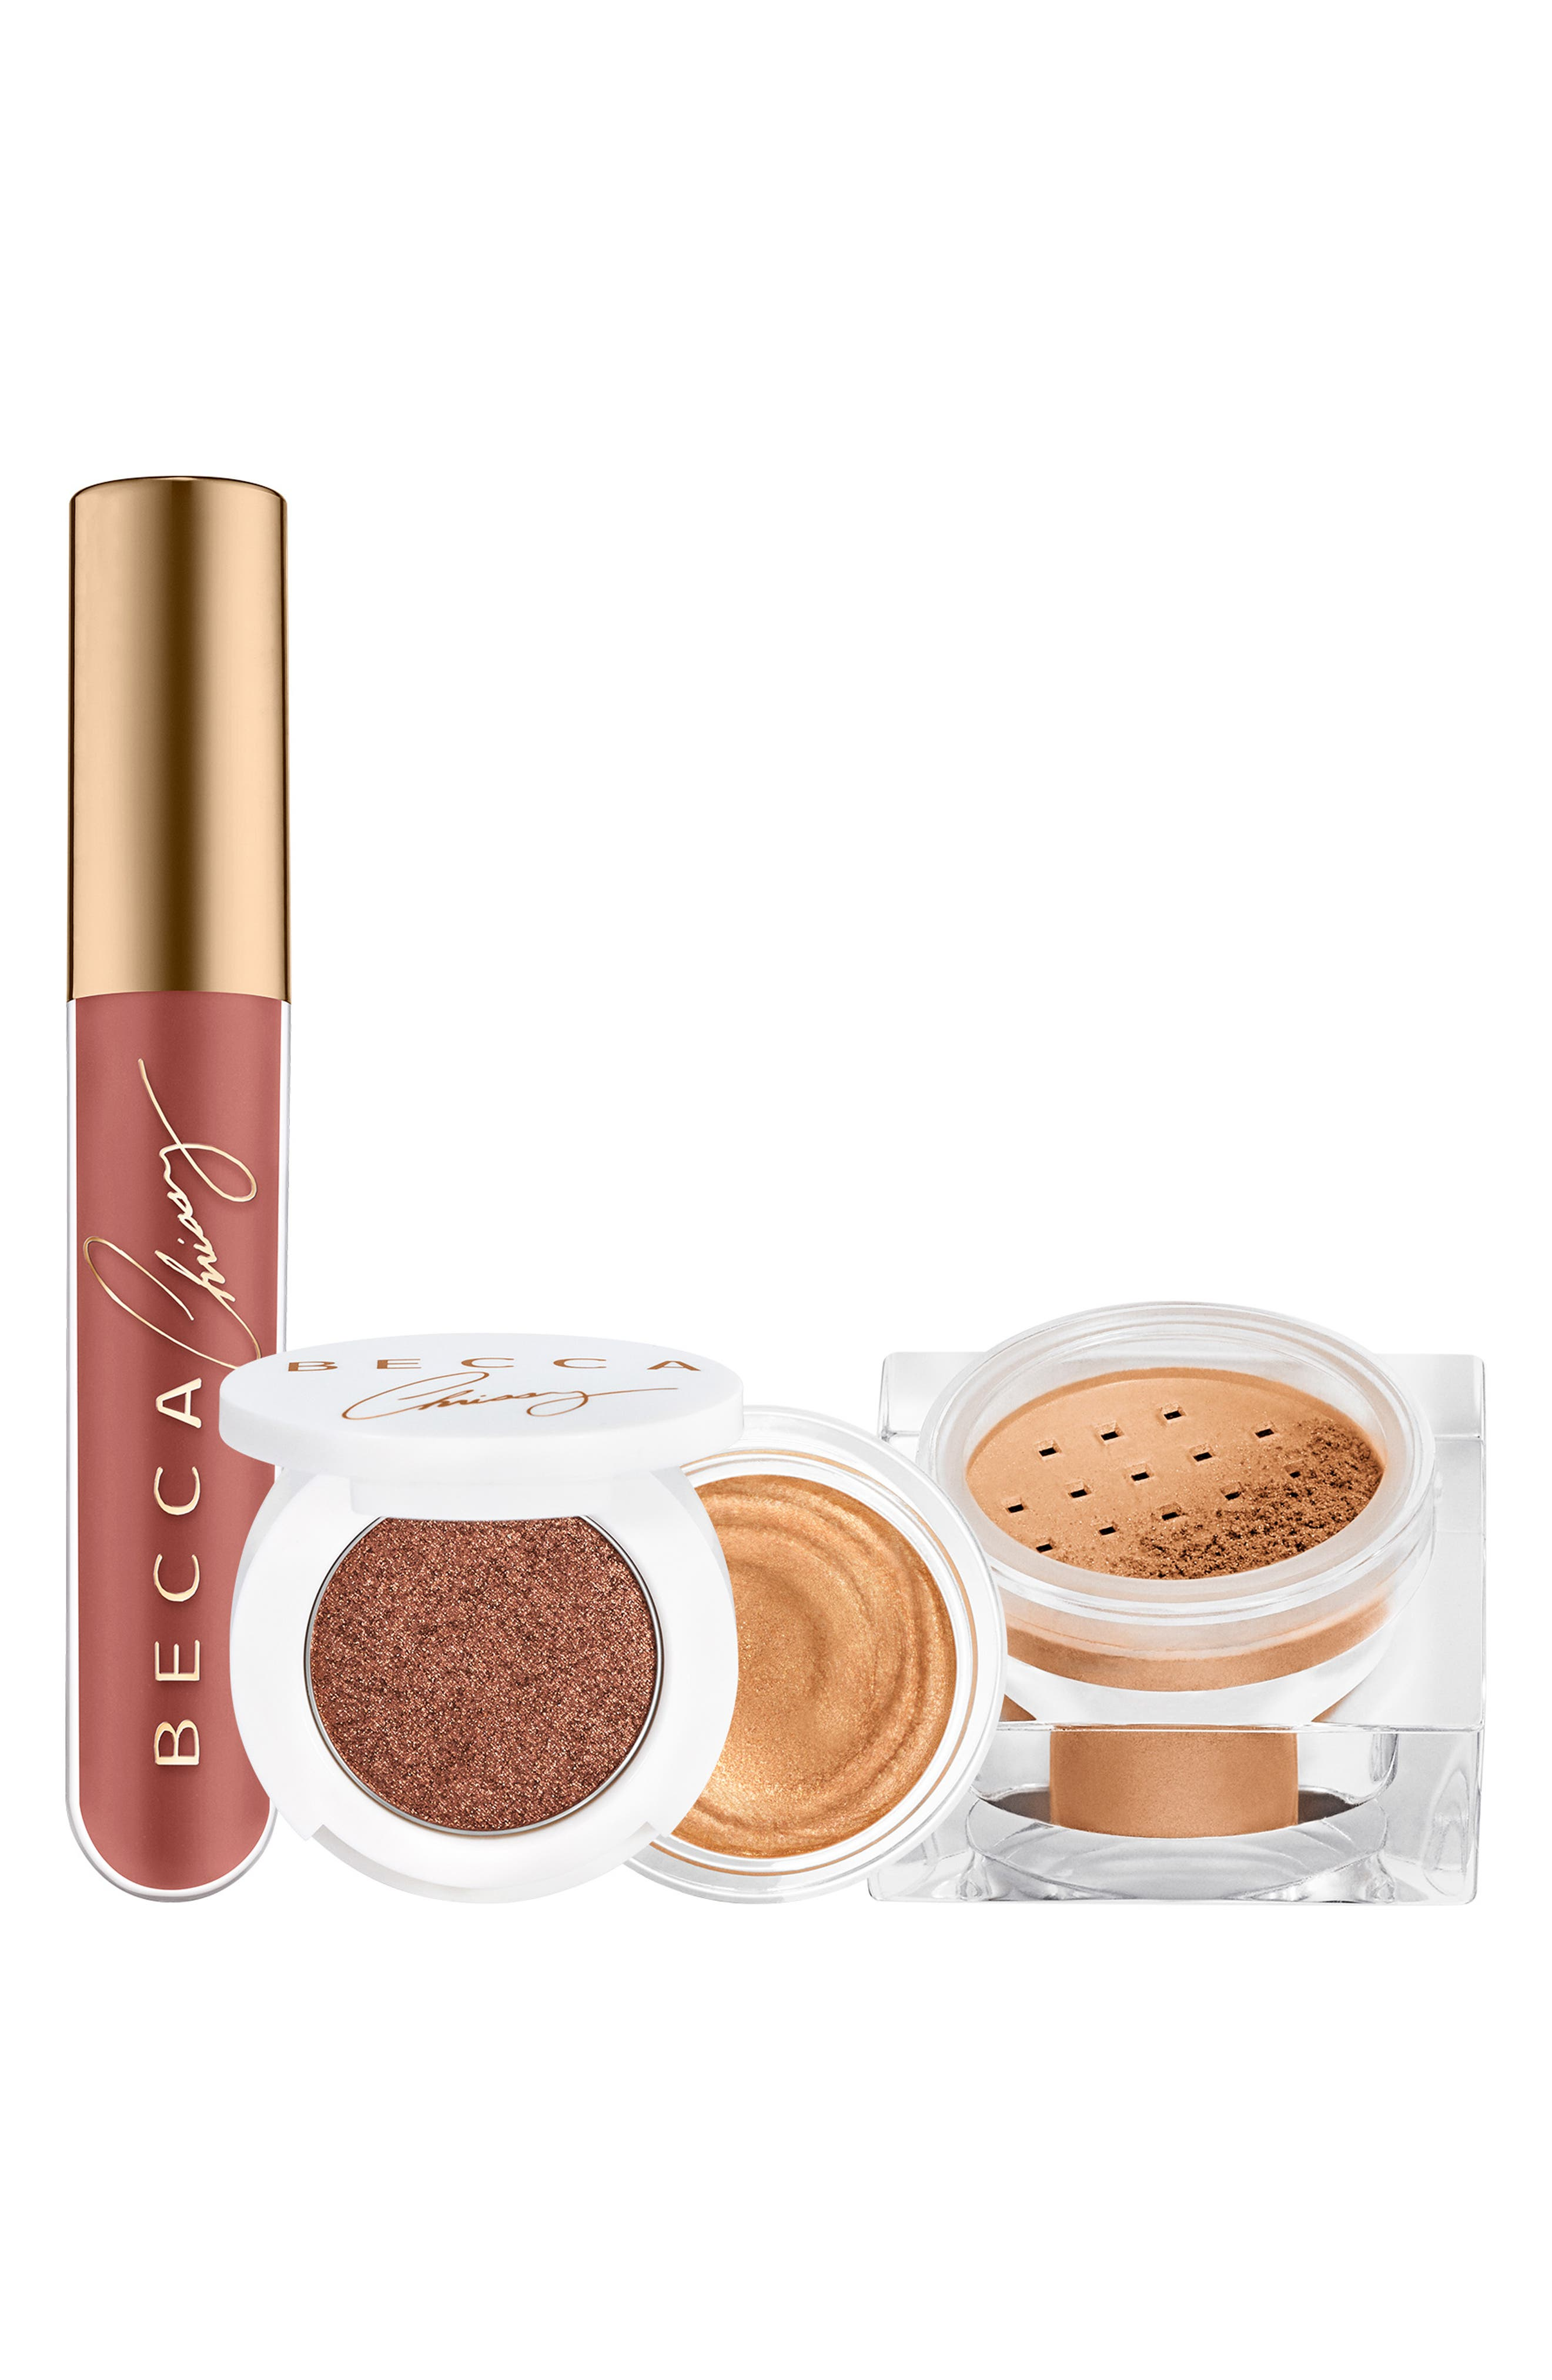 Image of BECCA Cosmetics Chrissy Cravings 3-Piece Glow Recipe Kit